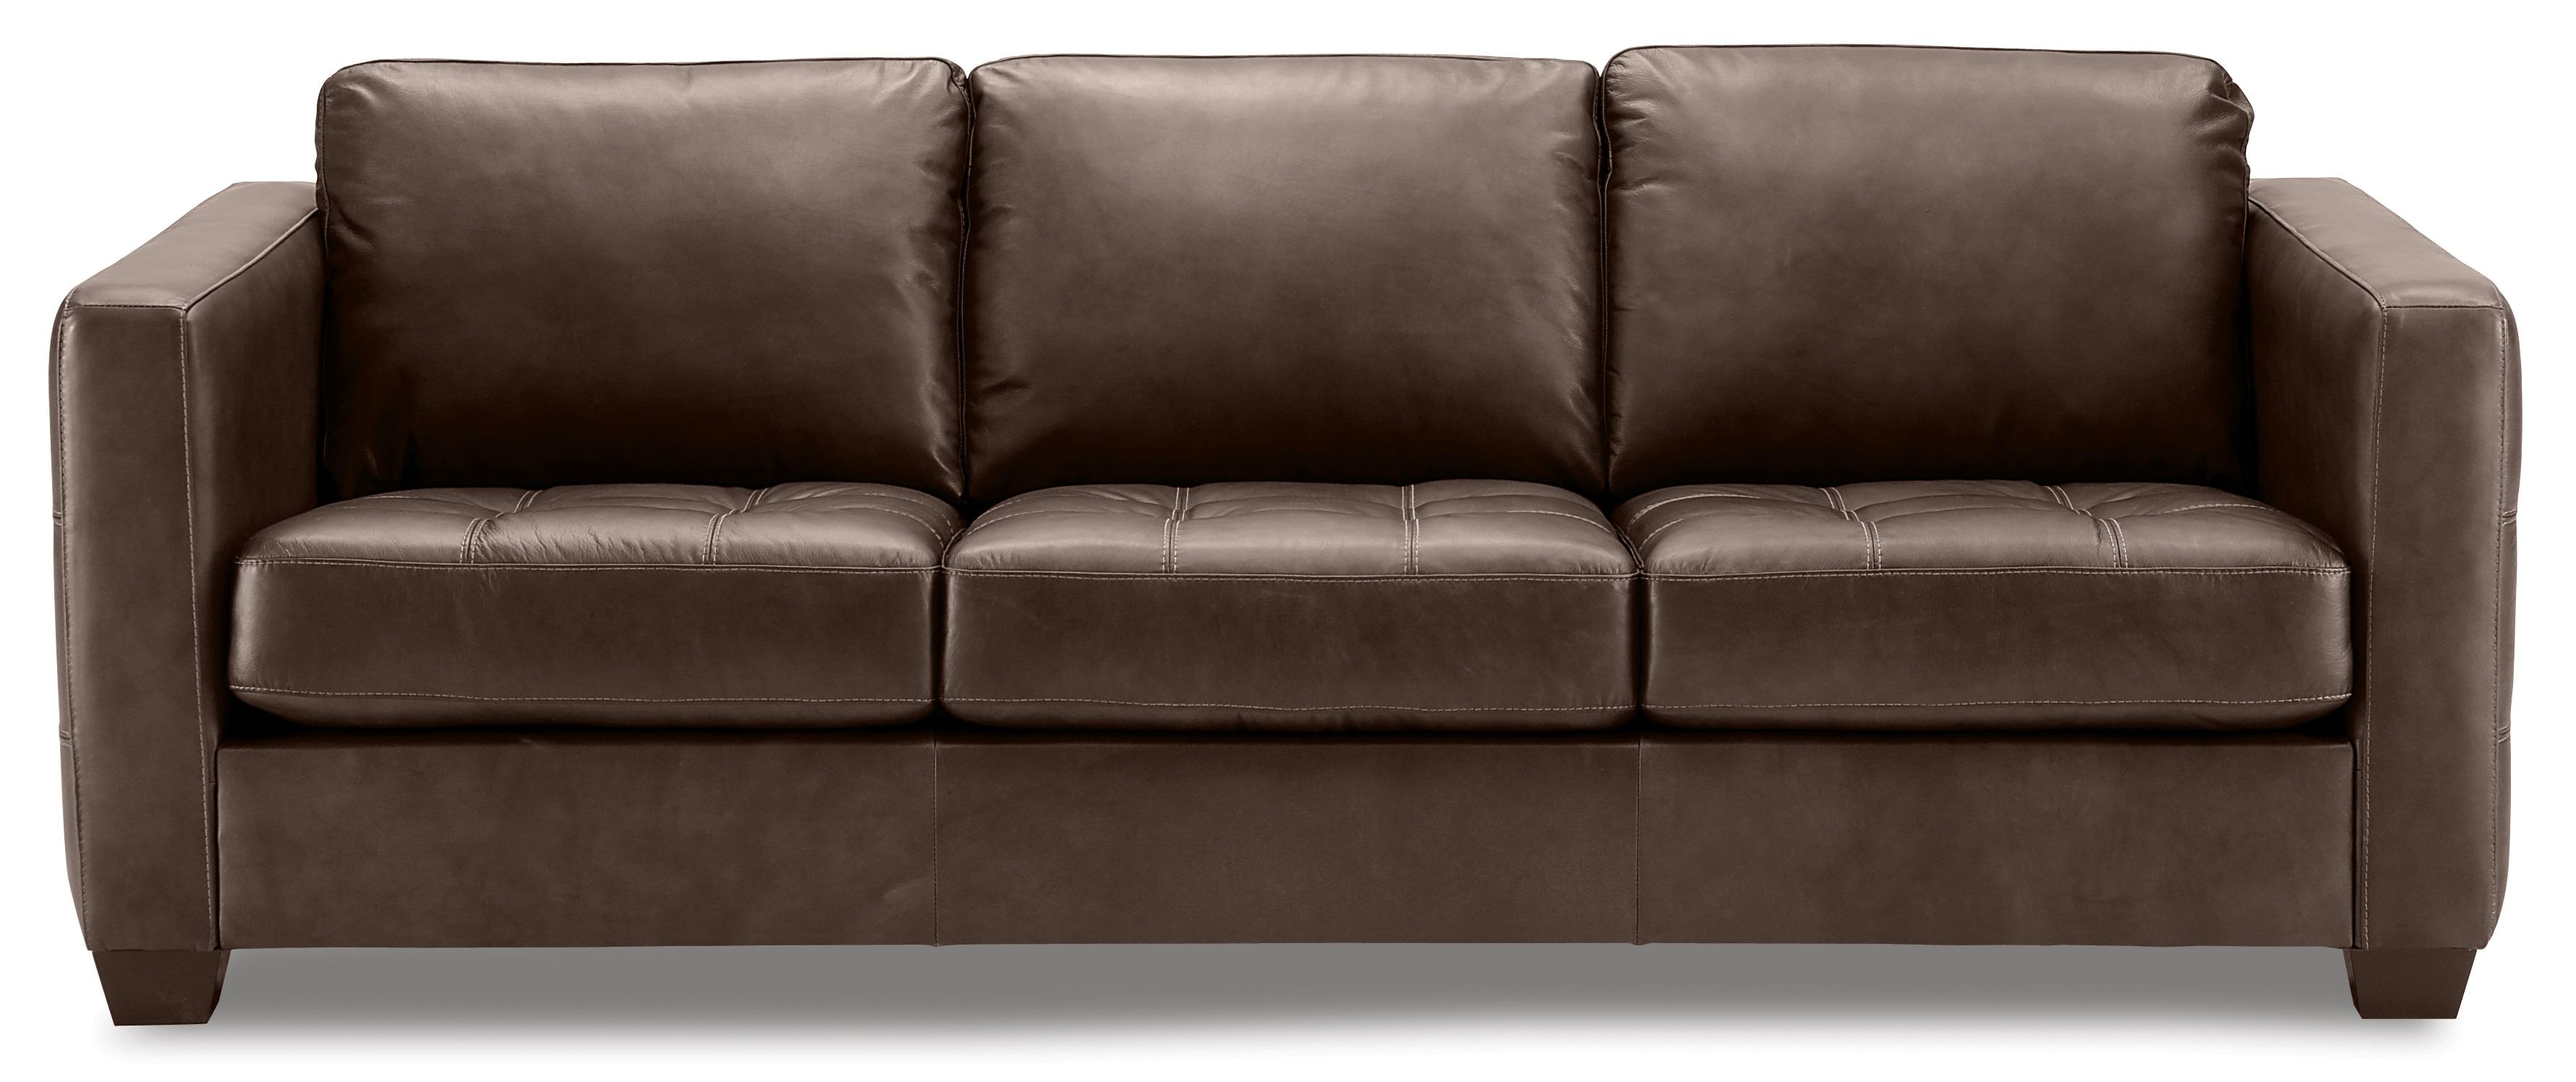 Superb Barrett Ottoman 77558 04 Sofas And Sectionals Creativecarmelina Interior Chair Design Creativecarmelinacom